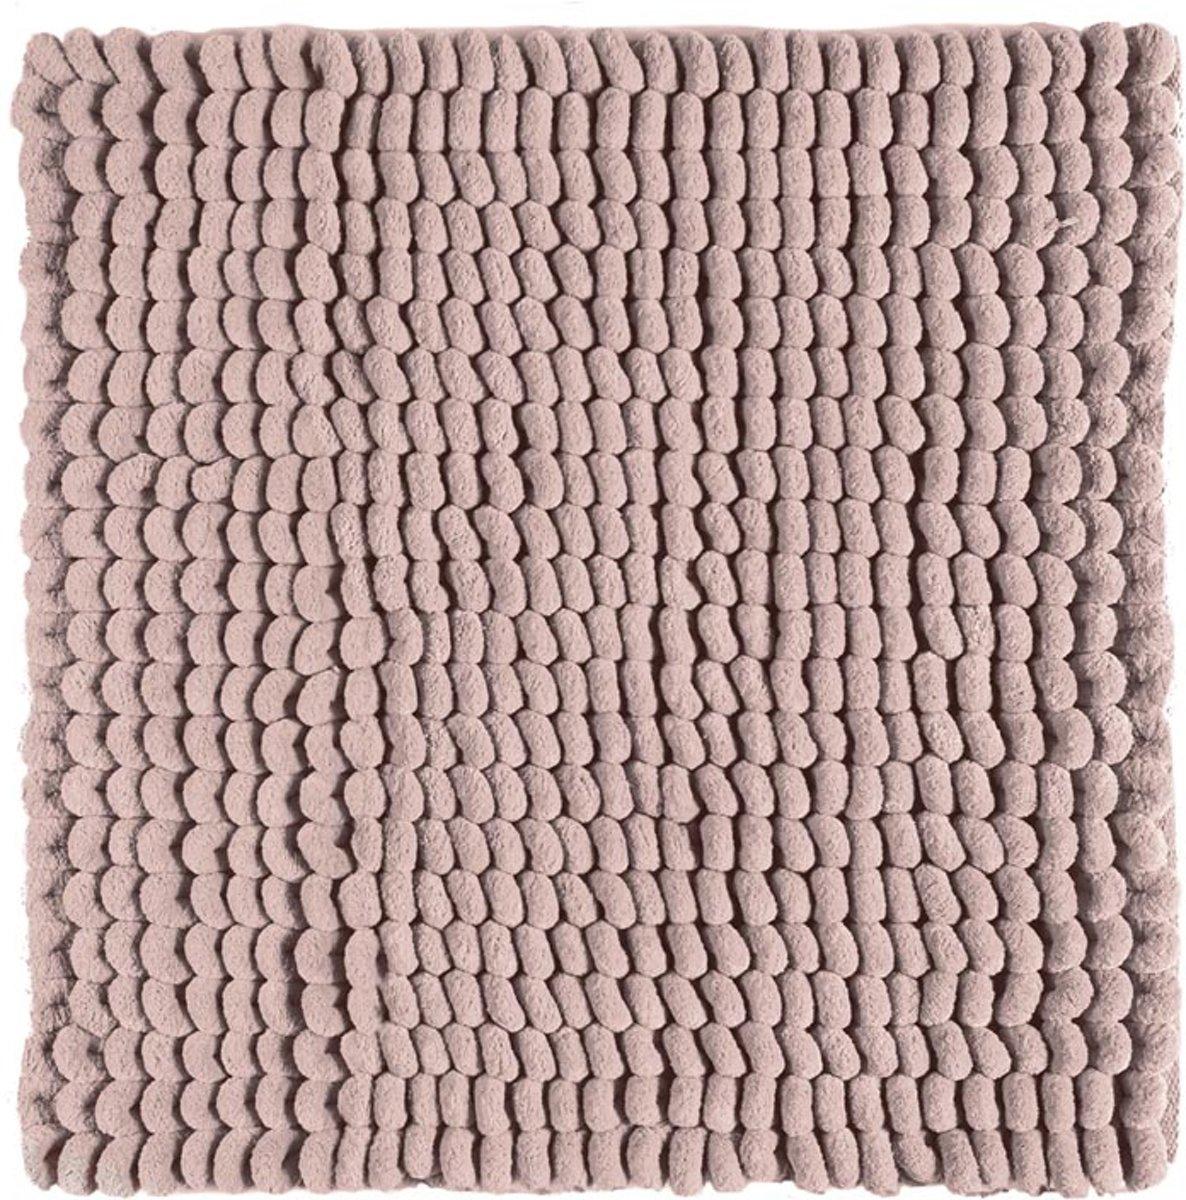 Aquanova Luka - Bidetmat - 60x60 cm - Dusty pink kopen